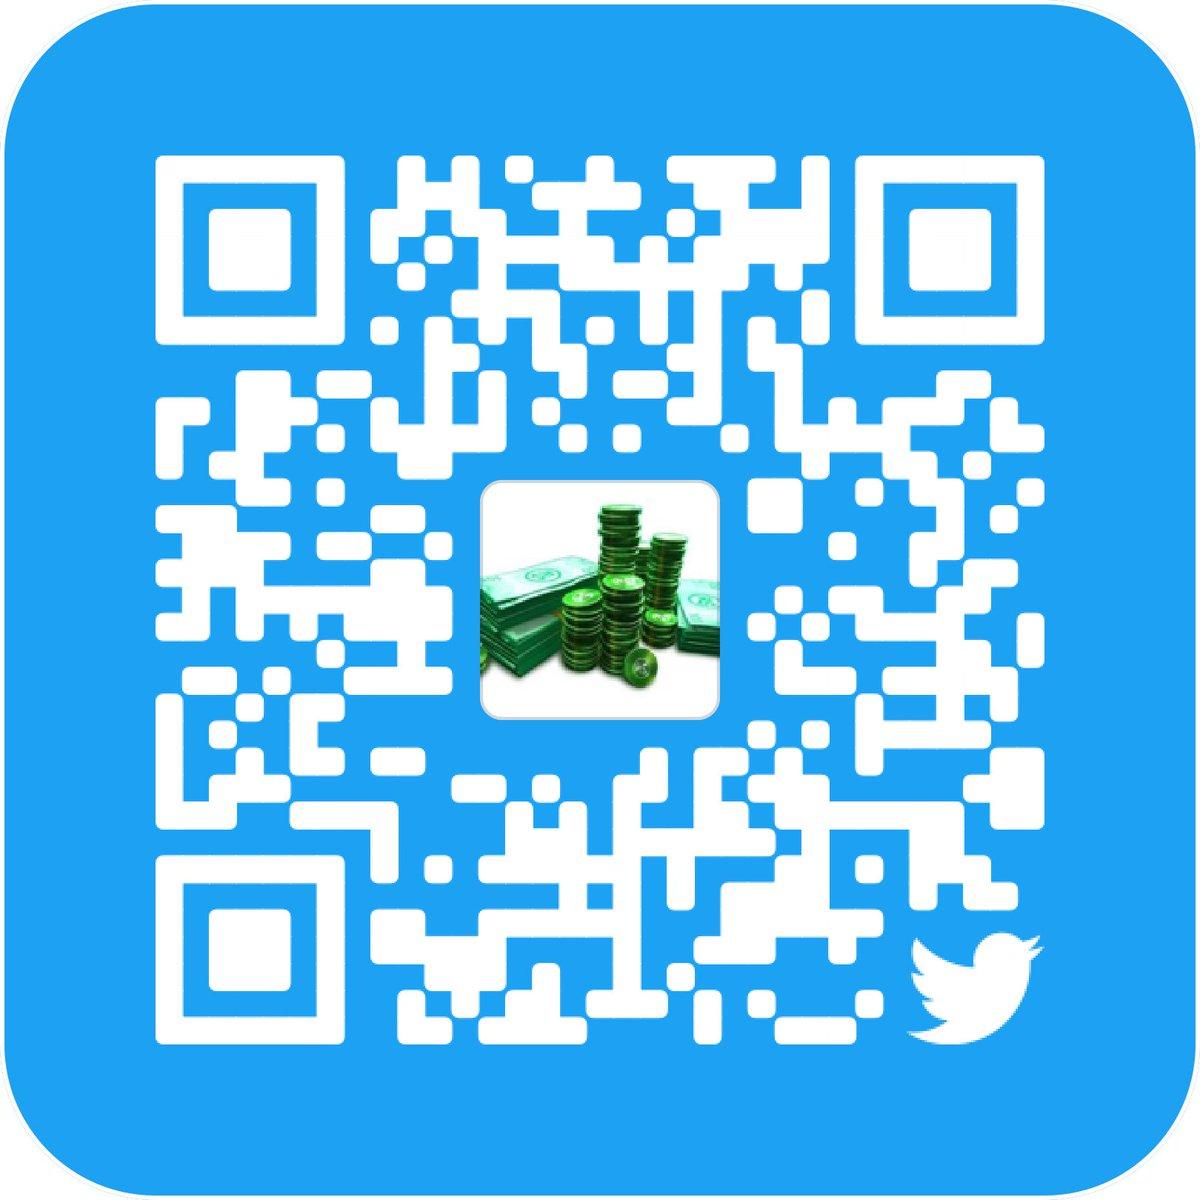 qr code robux Roblox Roblox Roblox Robuxro Twitter